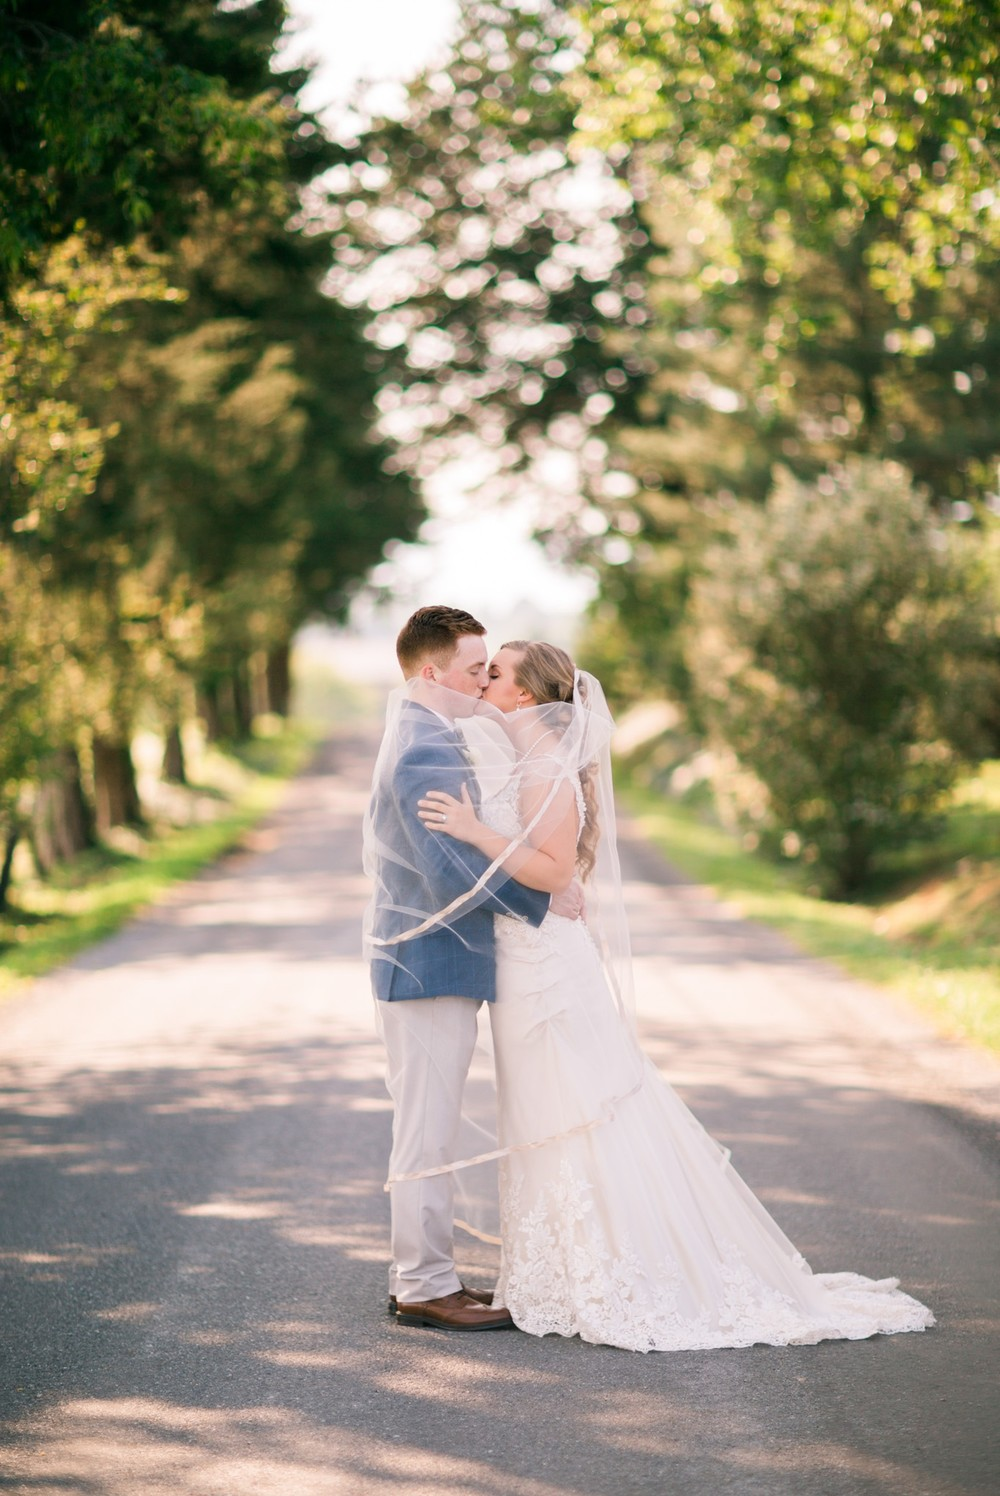 trivium_lynchburg_va_wedding_estate_wedding_photography_wedding_photographers (61).jpg